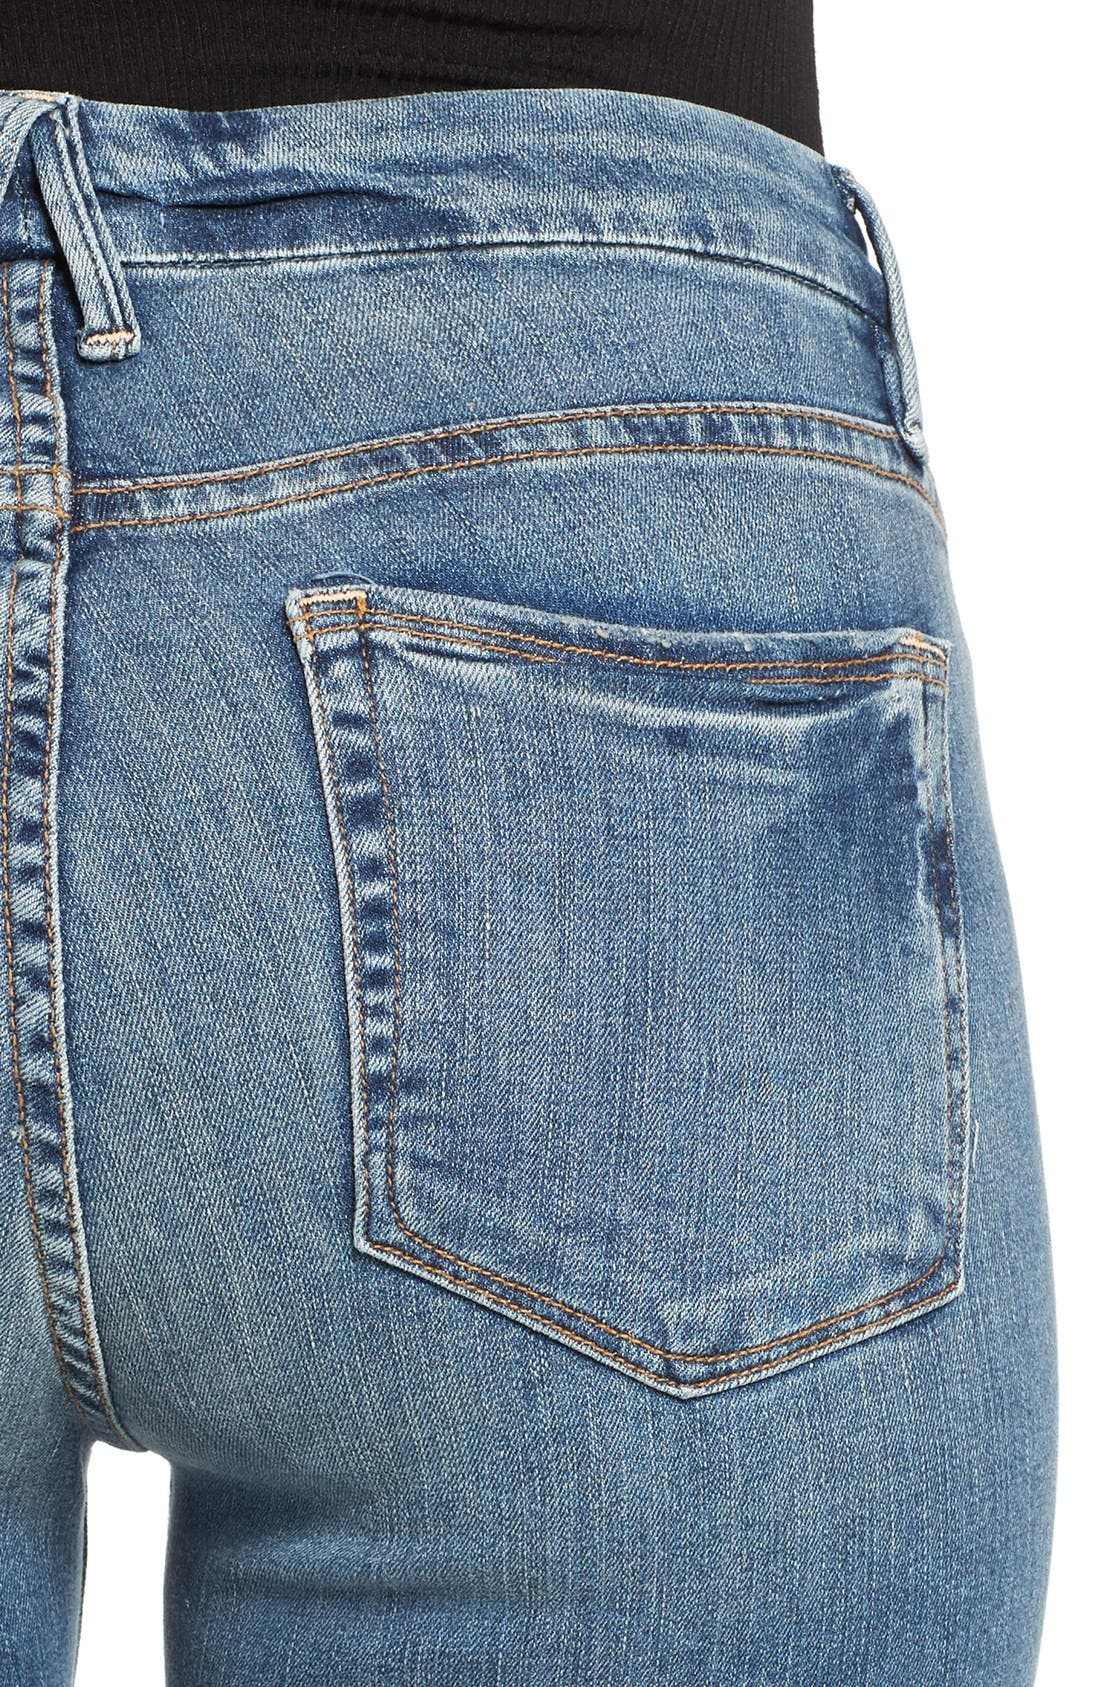 Alternate Image 4  - Good American Good Legs High Rise Ripped Skinny Jeans (Blue 006)